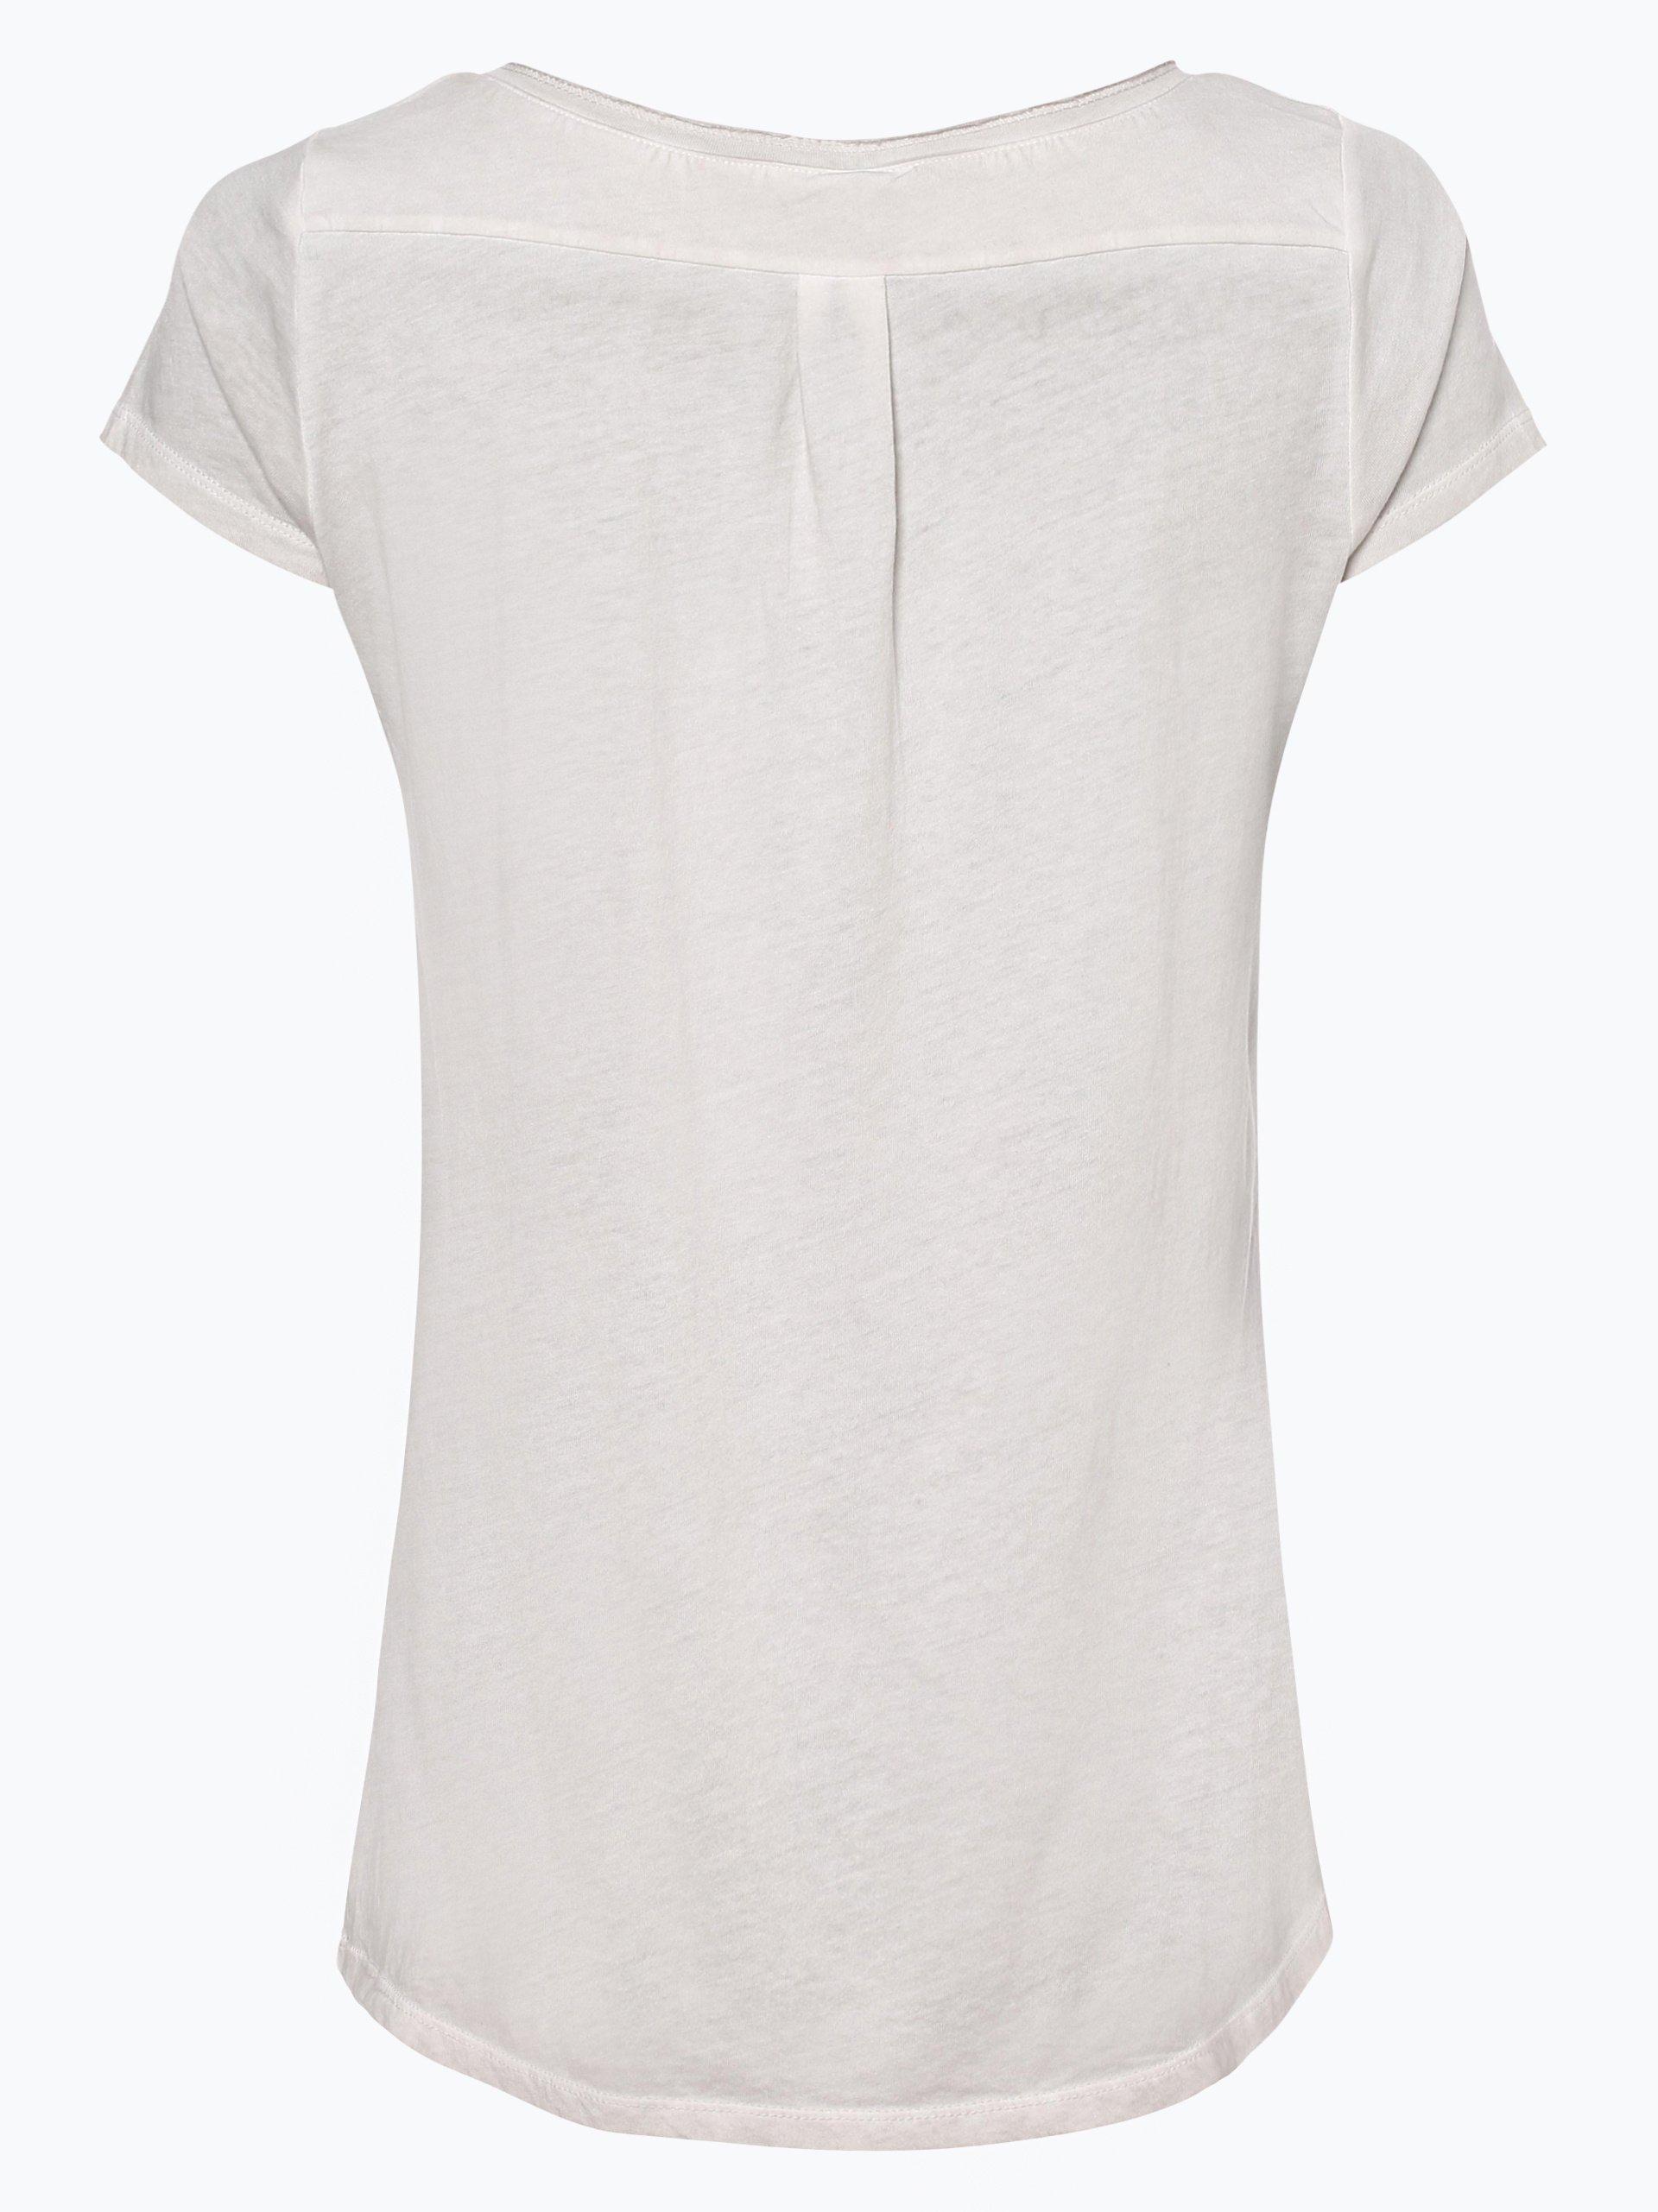 key largo damen t shirt sand grau gemustert online kaufen vangraaf com. Black Bedroom Furniture Sets. Home Design Ideas